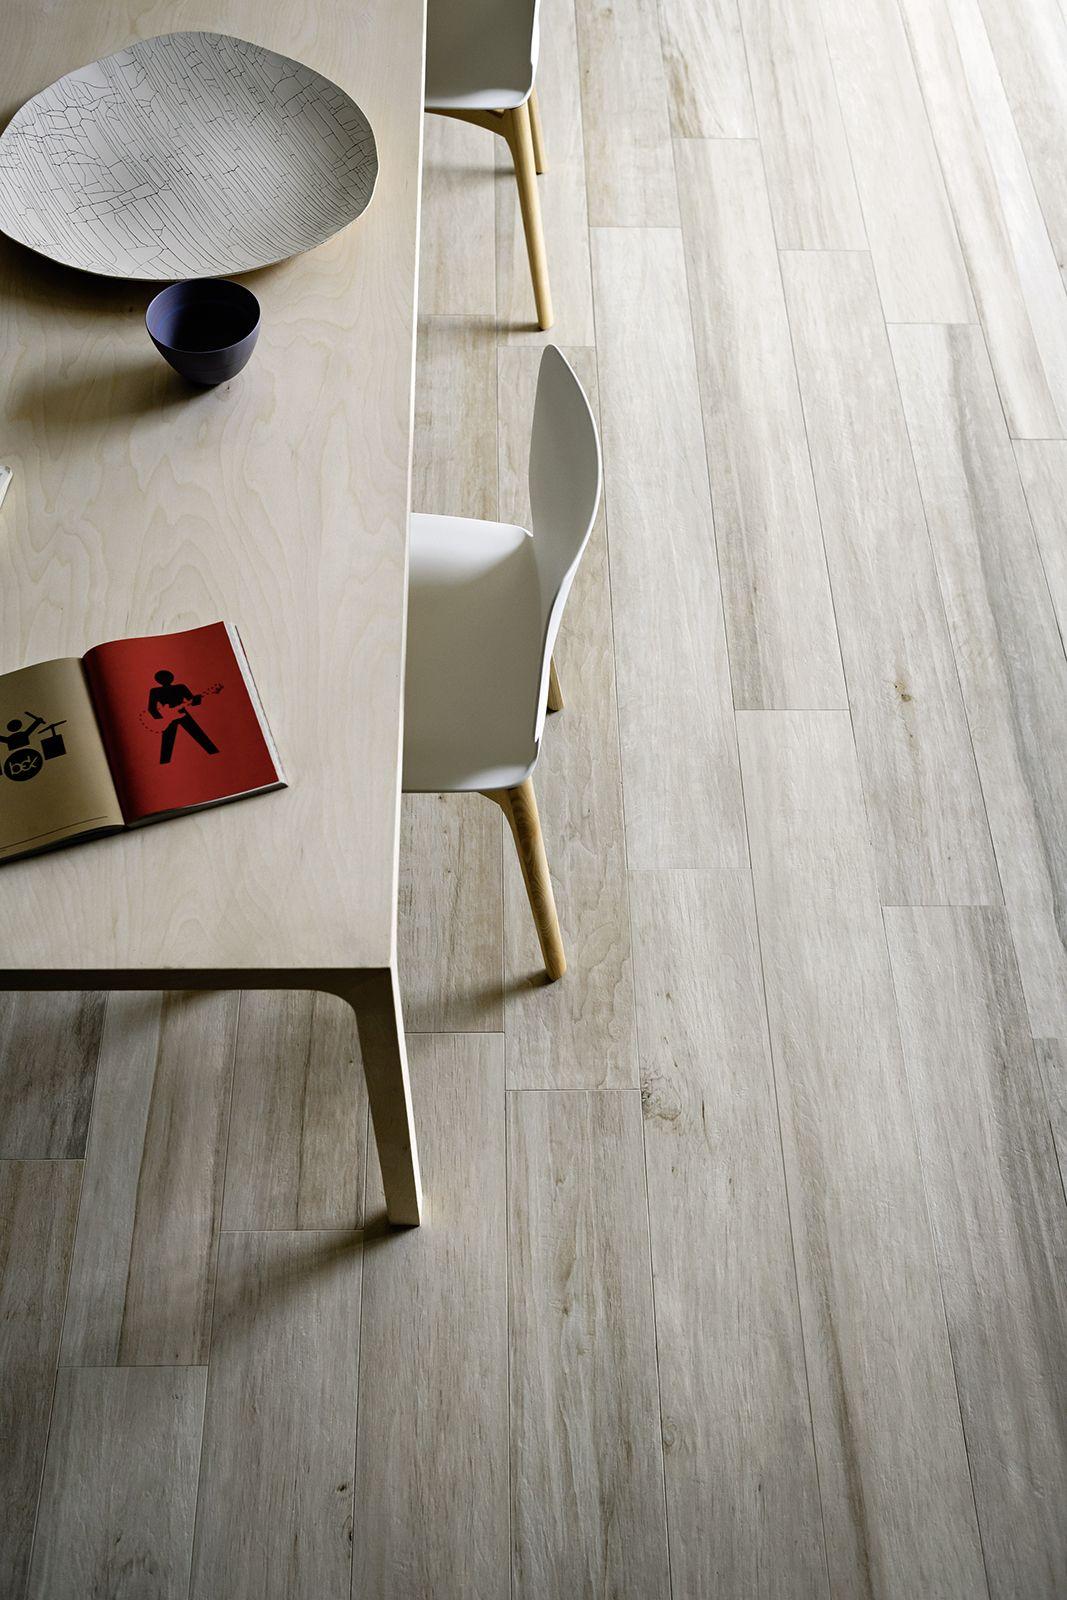 Marazzi Treverkchic Simple Cozy Messy Scandi Flooring Tiles